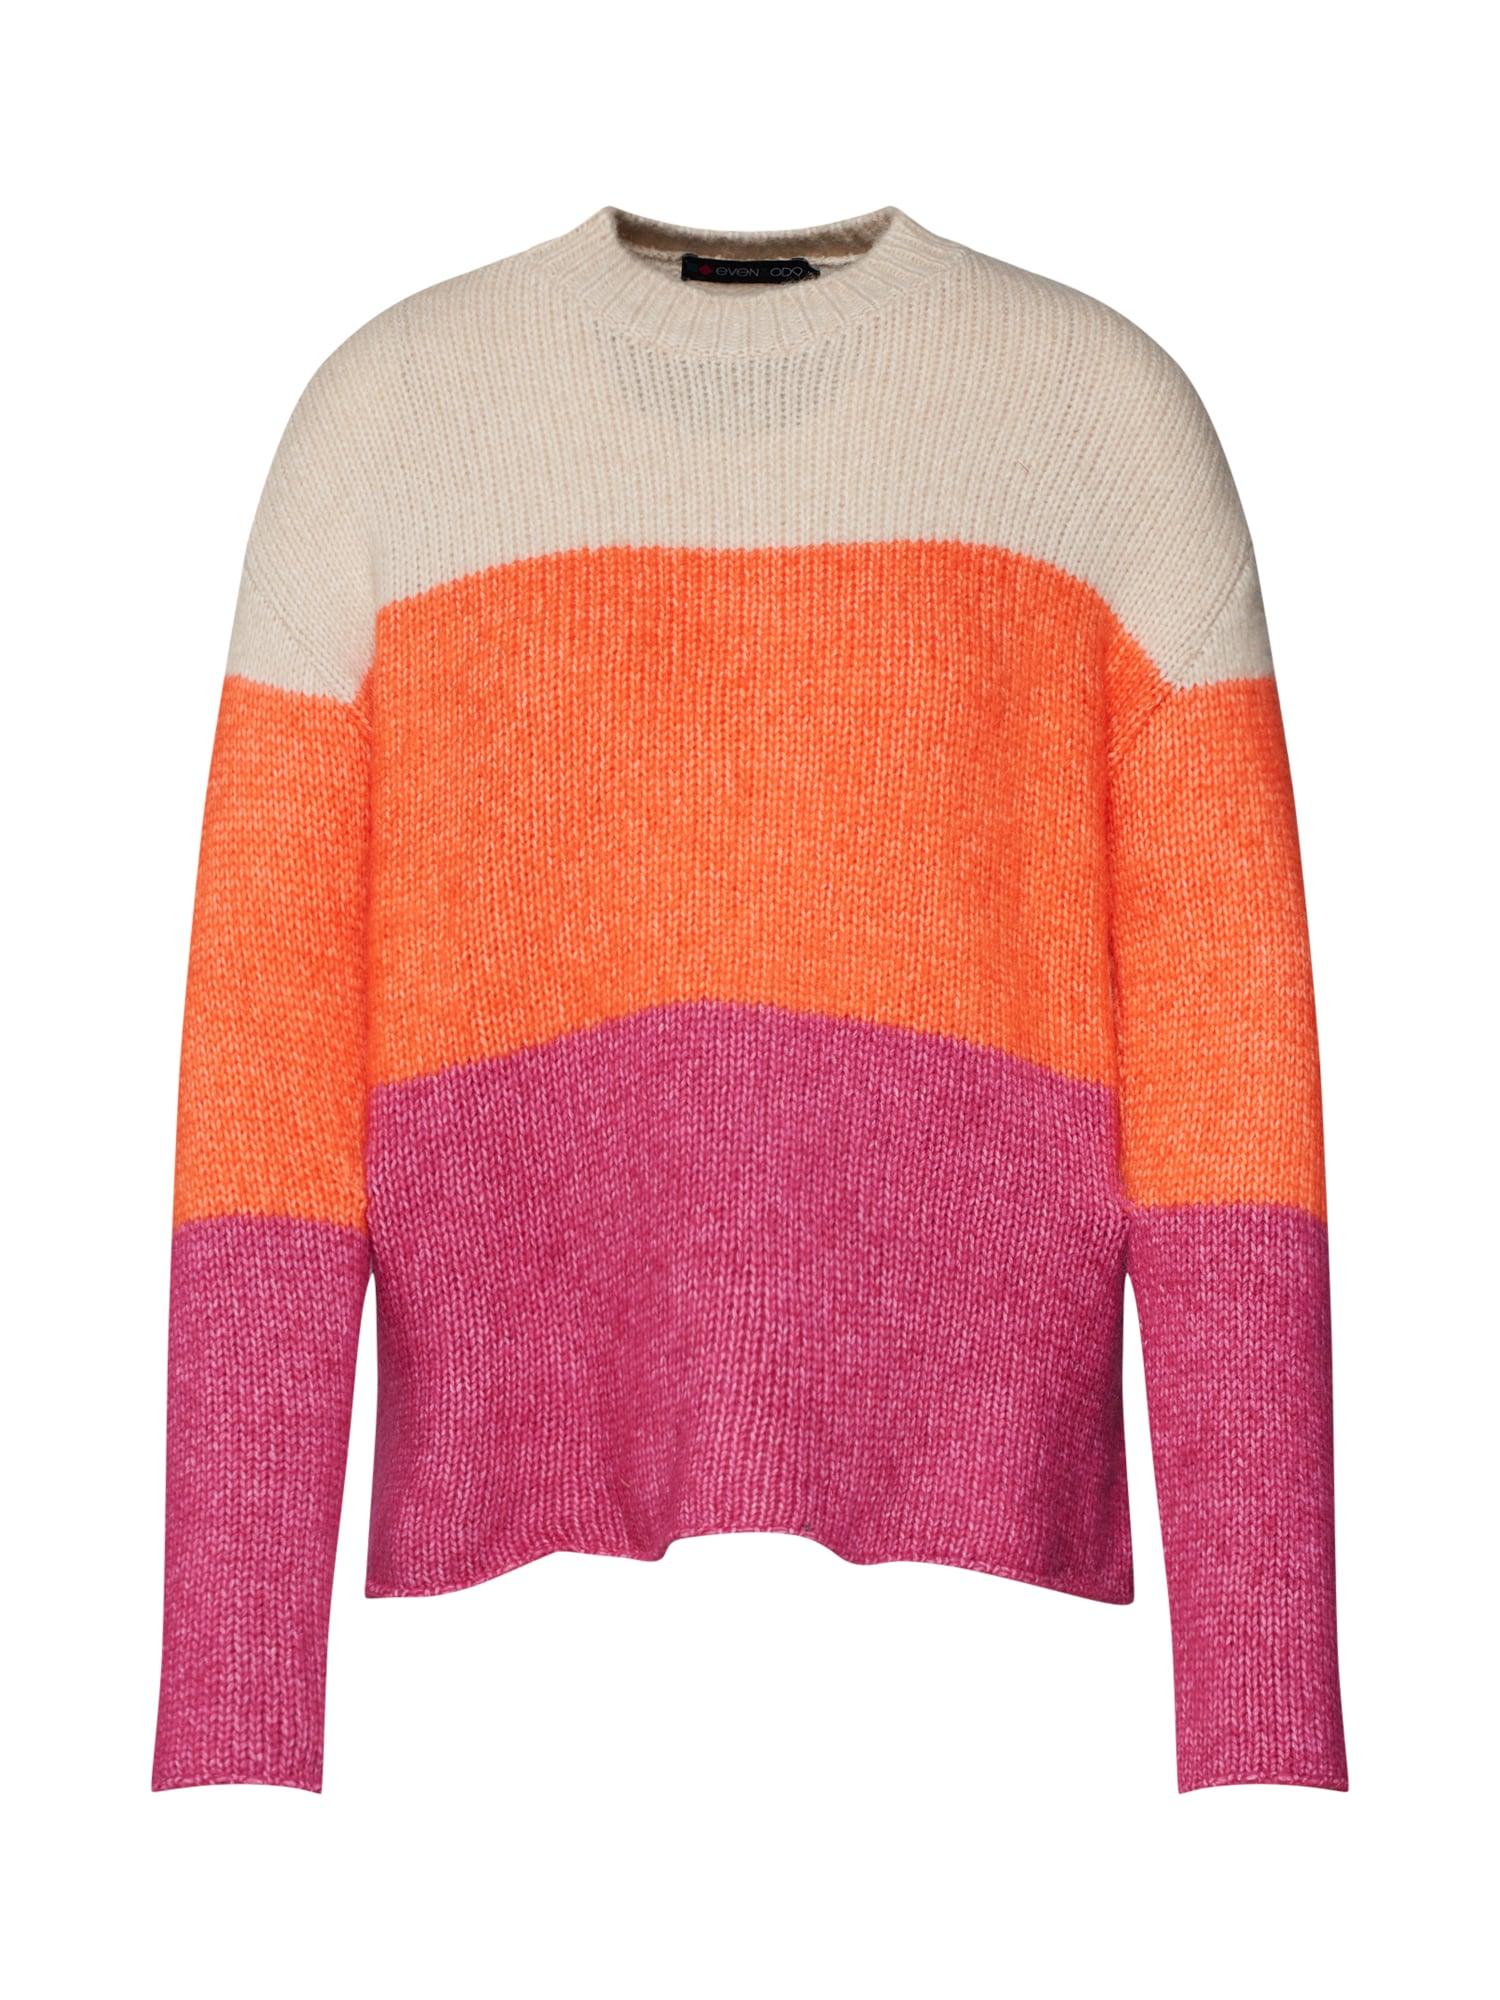 Svetr Colour Block stripes jumper oranžová pink červená Even&odd